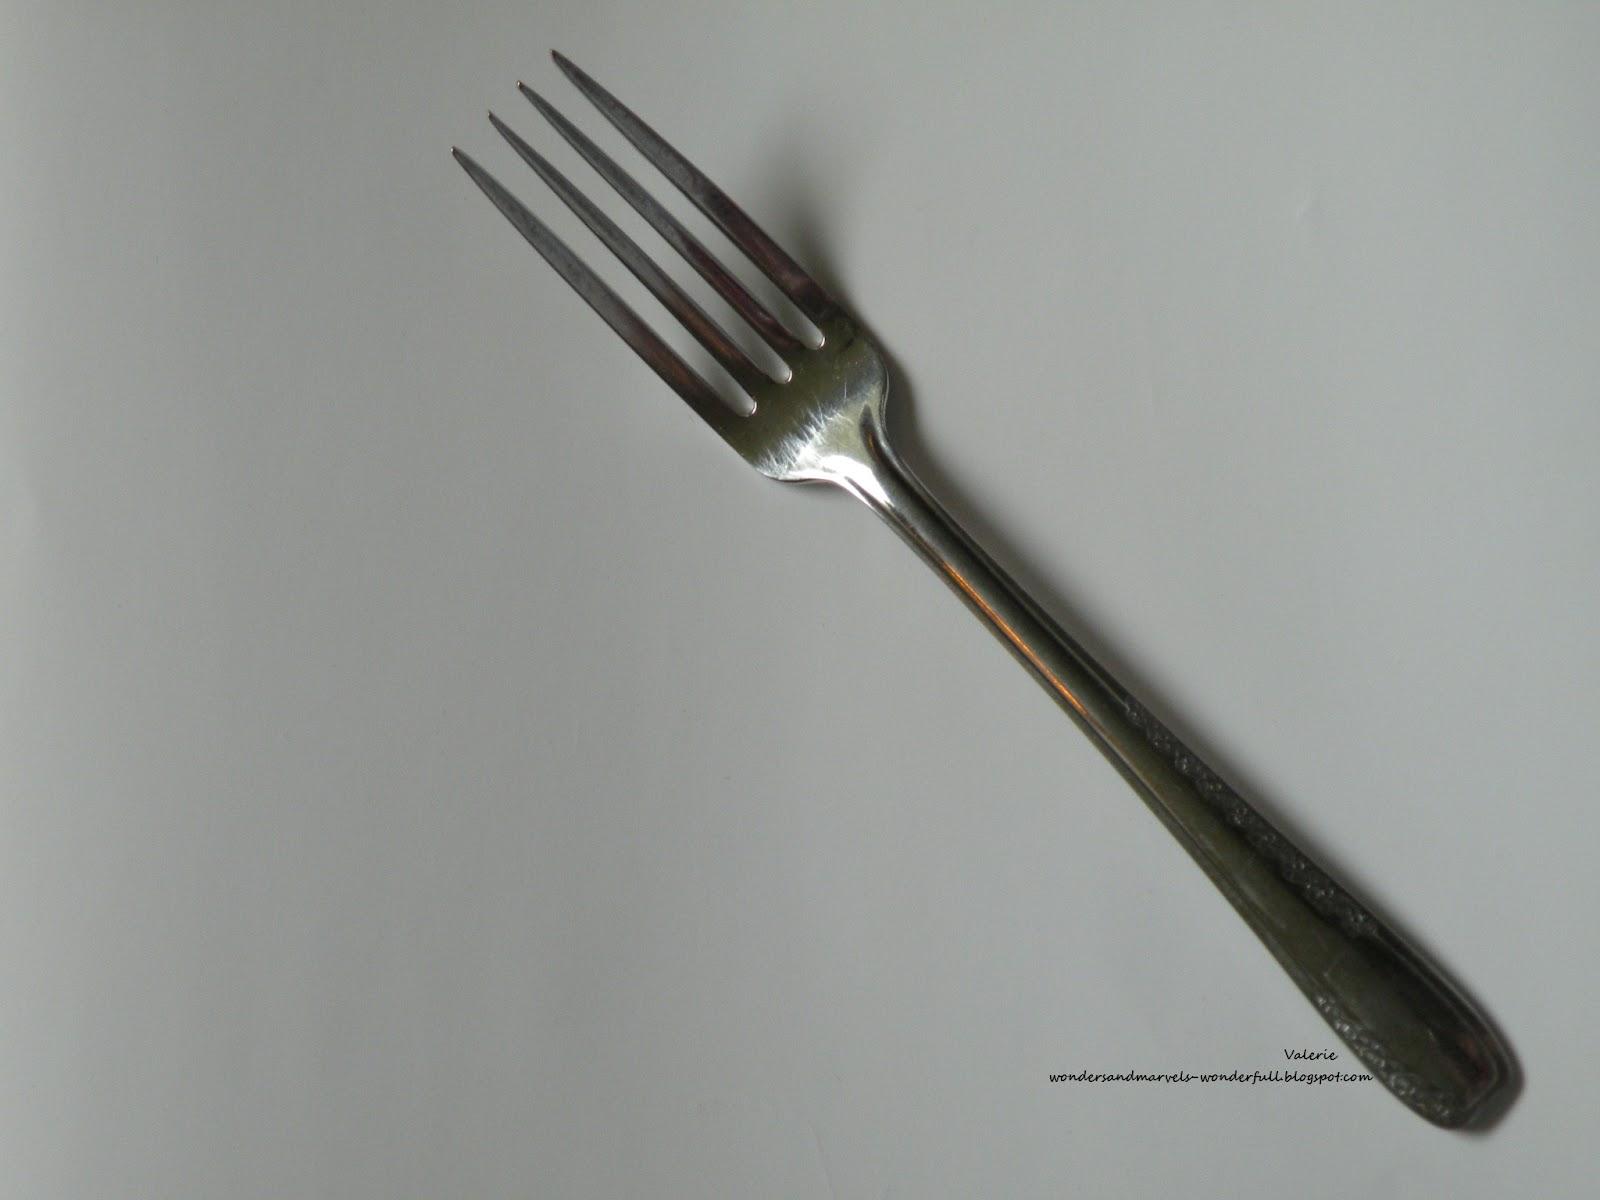 http://3.bp.blogspot.com/-s0PBqMXVh7Q/T6gD1RntDqI/AAAAAAAAArI/aIUiGvxLGU8/s1600/fork.jpg